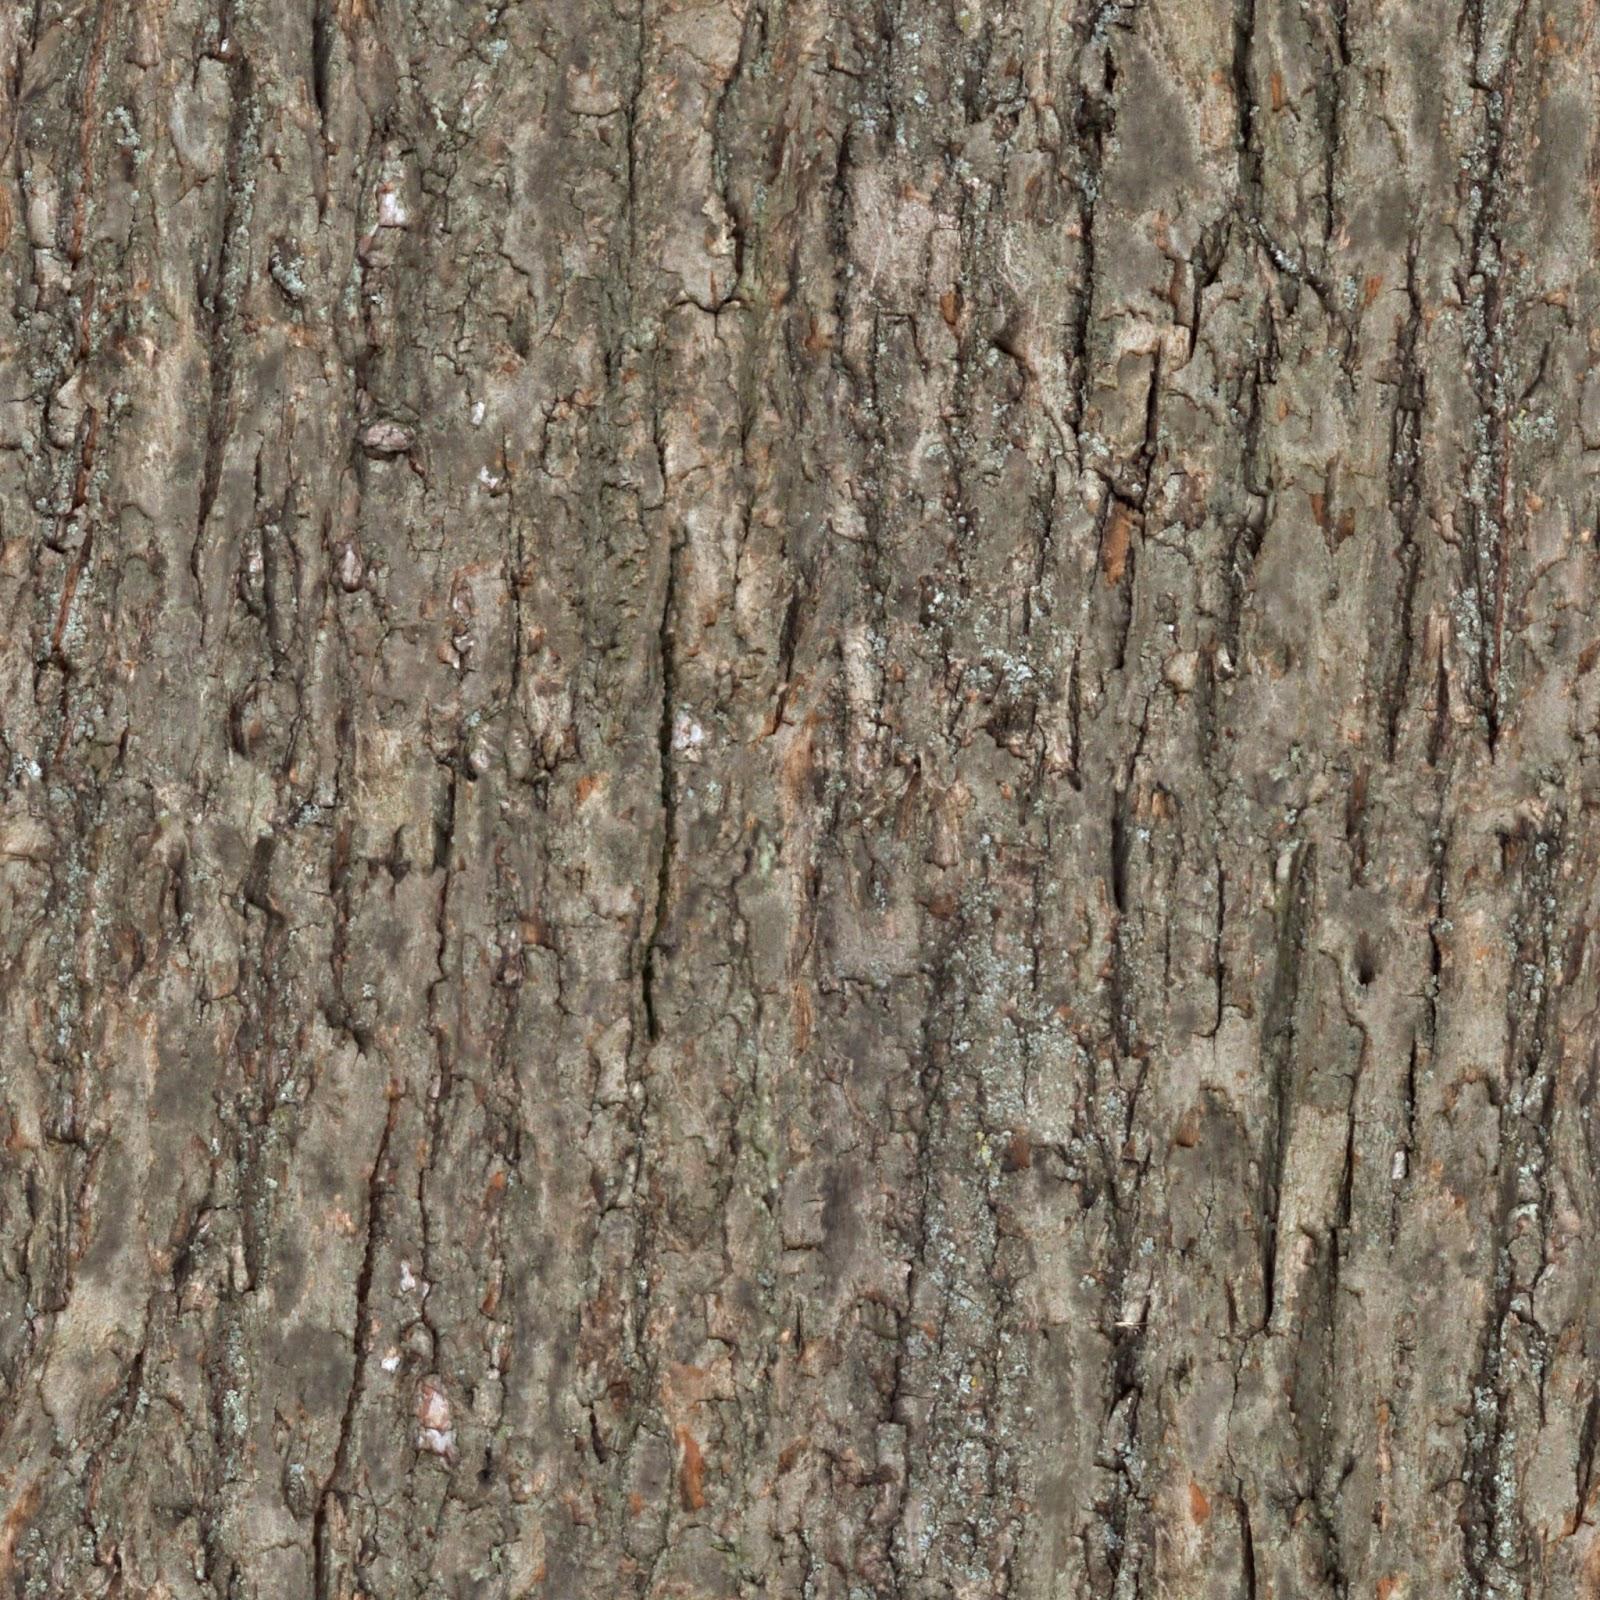 Wood bark photo